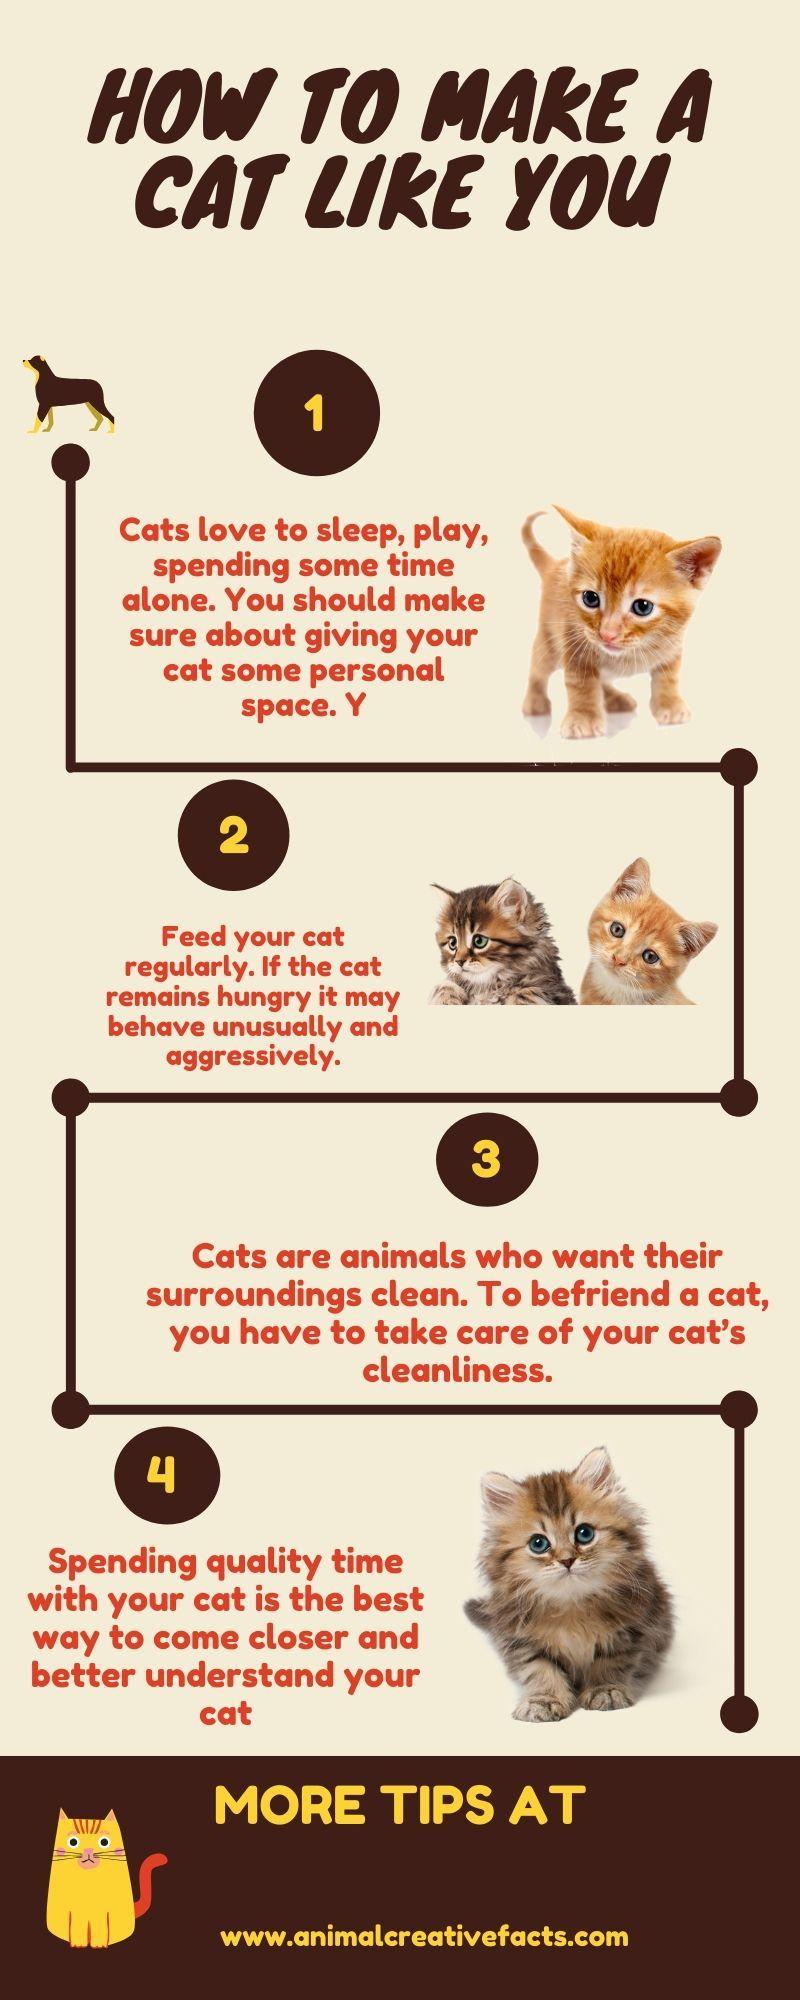 6644e470de14c6be9242114fa4306266 - How Do You Get Your Cat To Like You